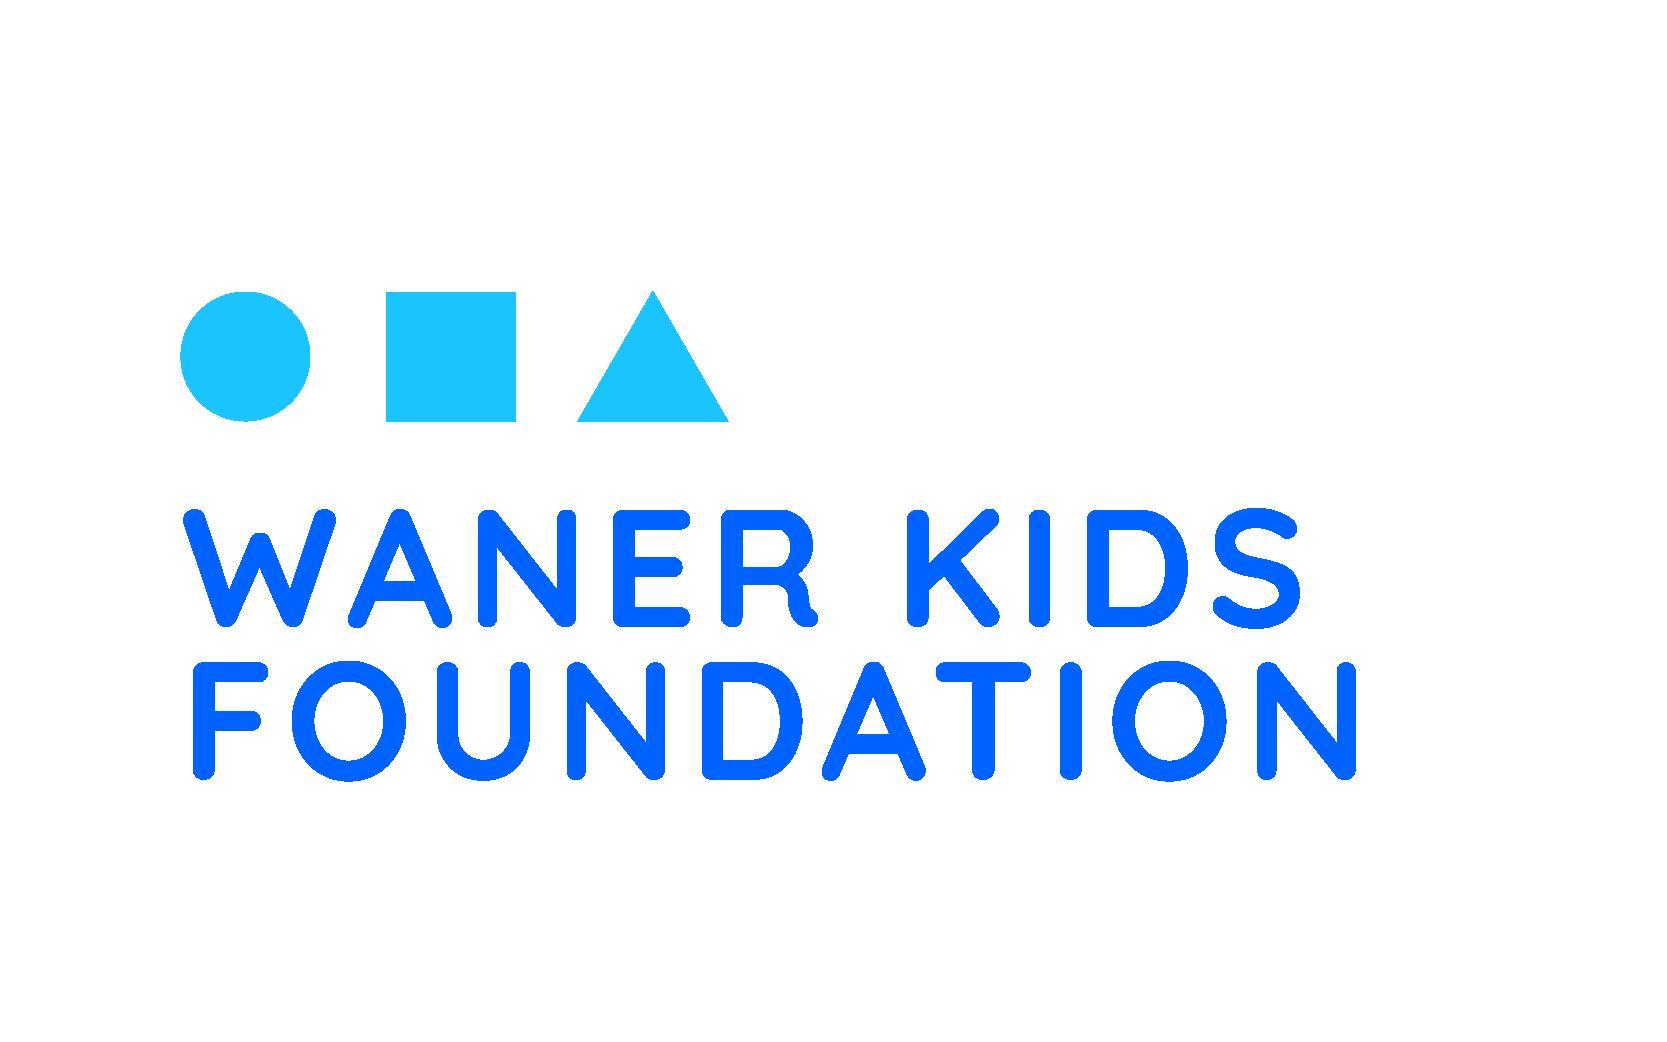 Waner Kids Foundation